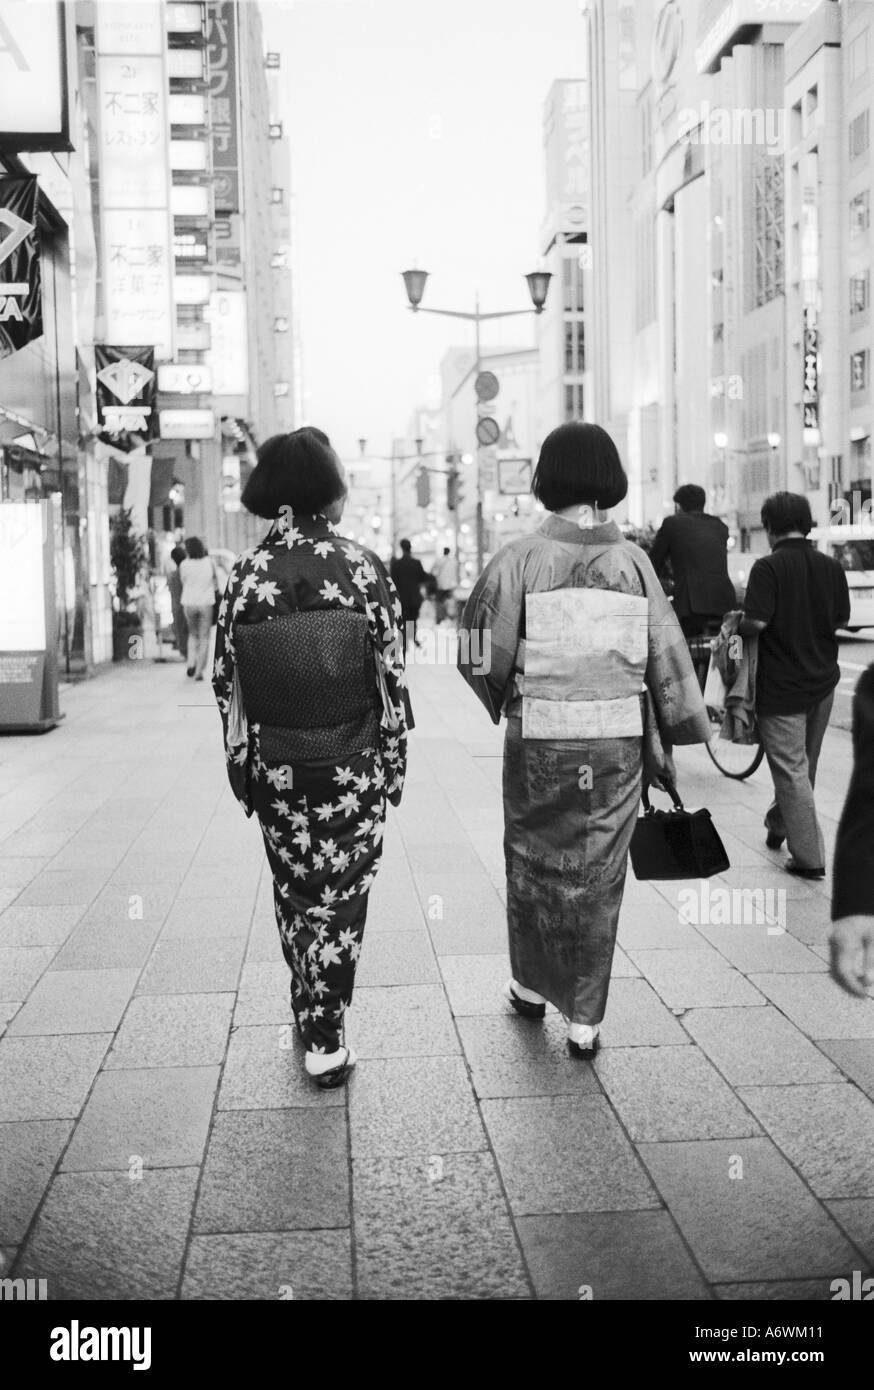 Asia, Japan, Tokyo. Geishas on the Ginza. Stock Photo